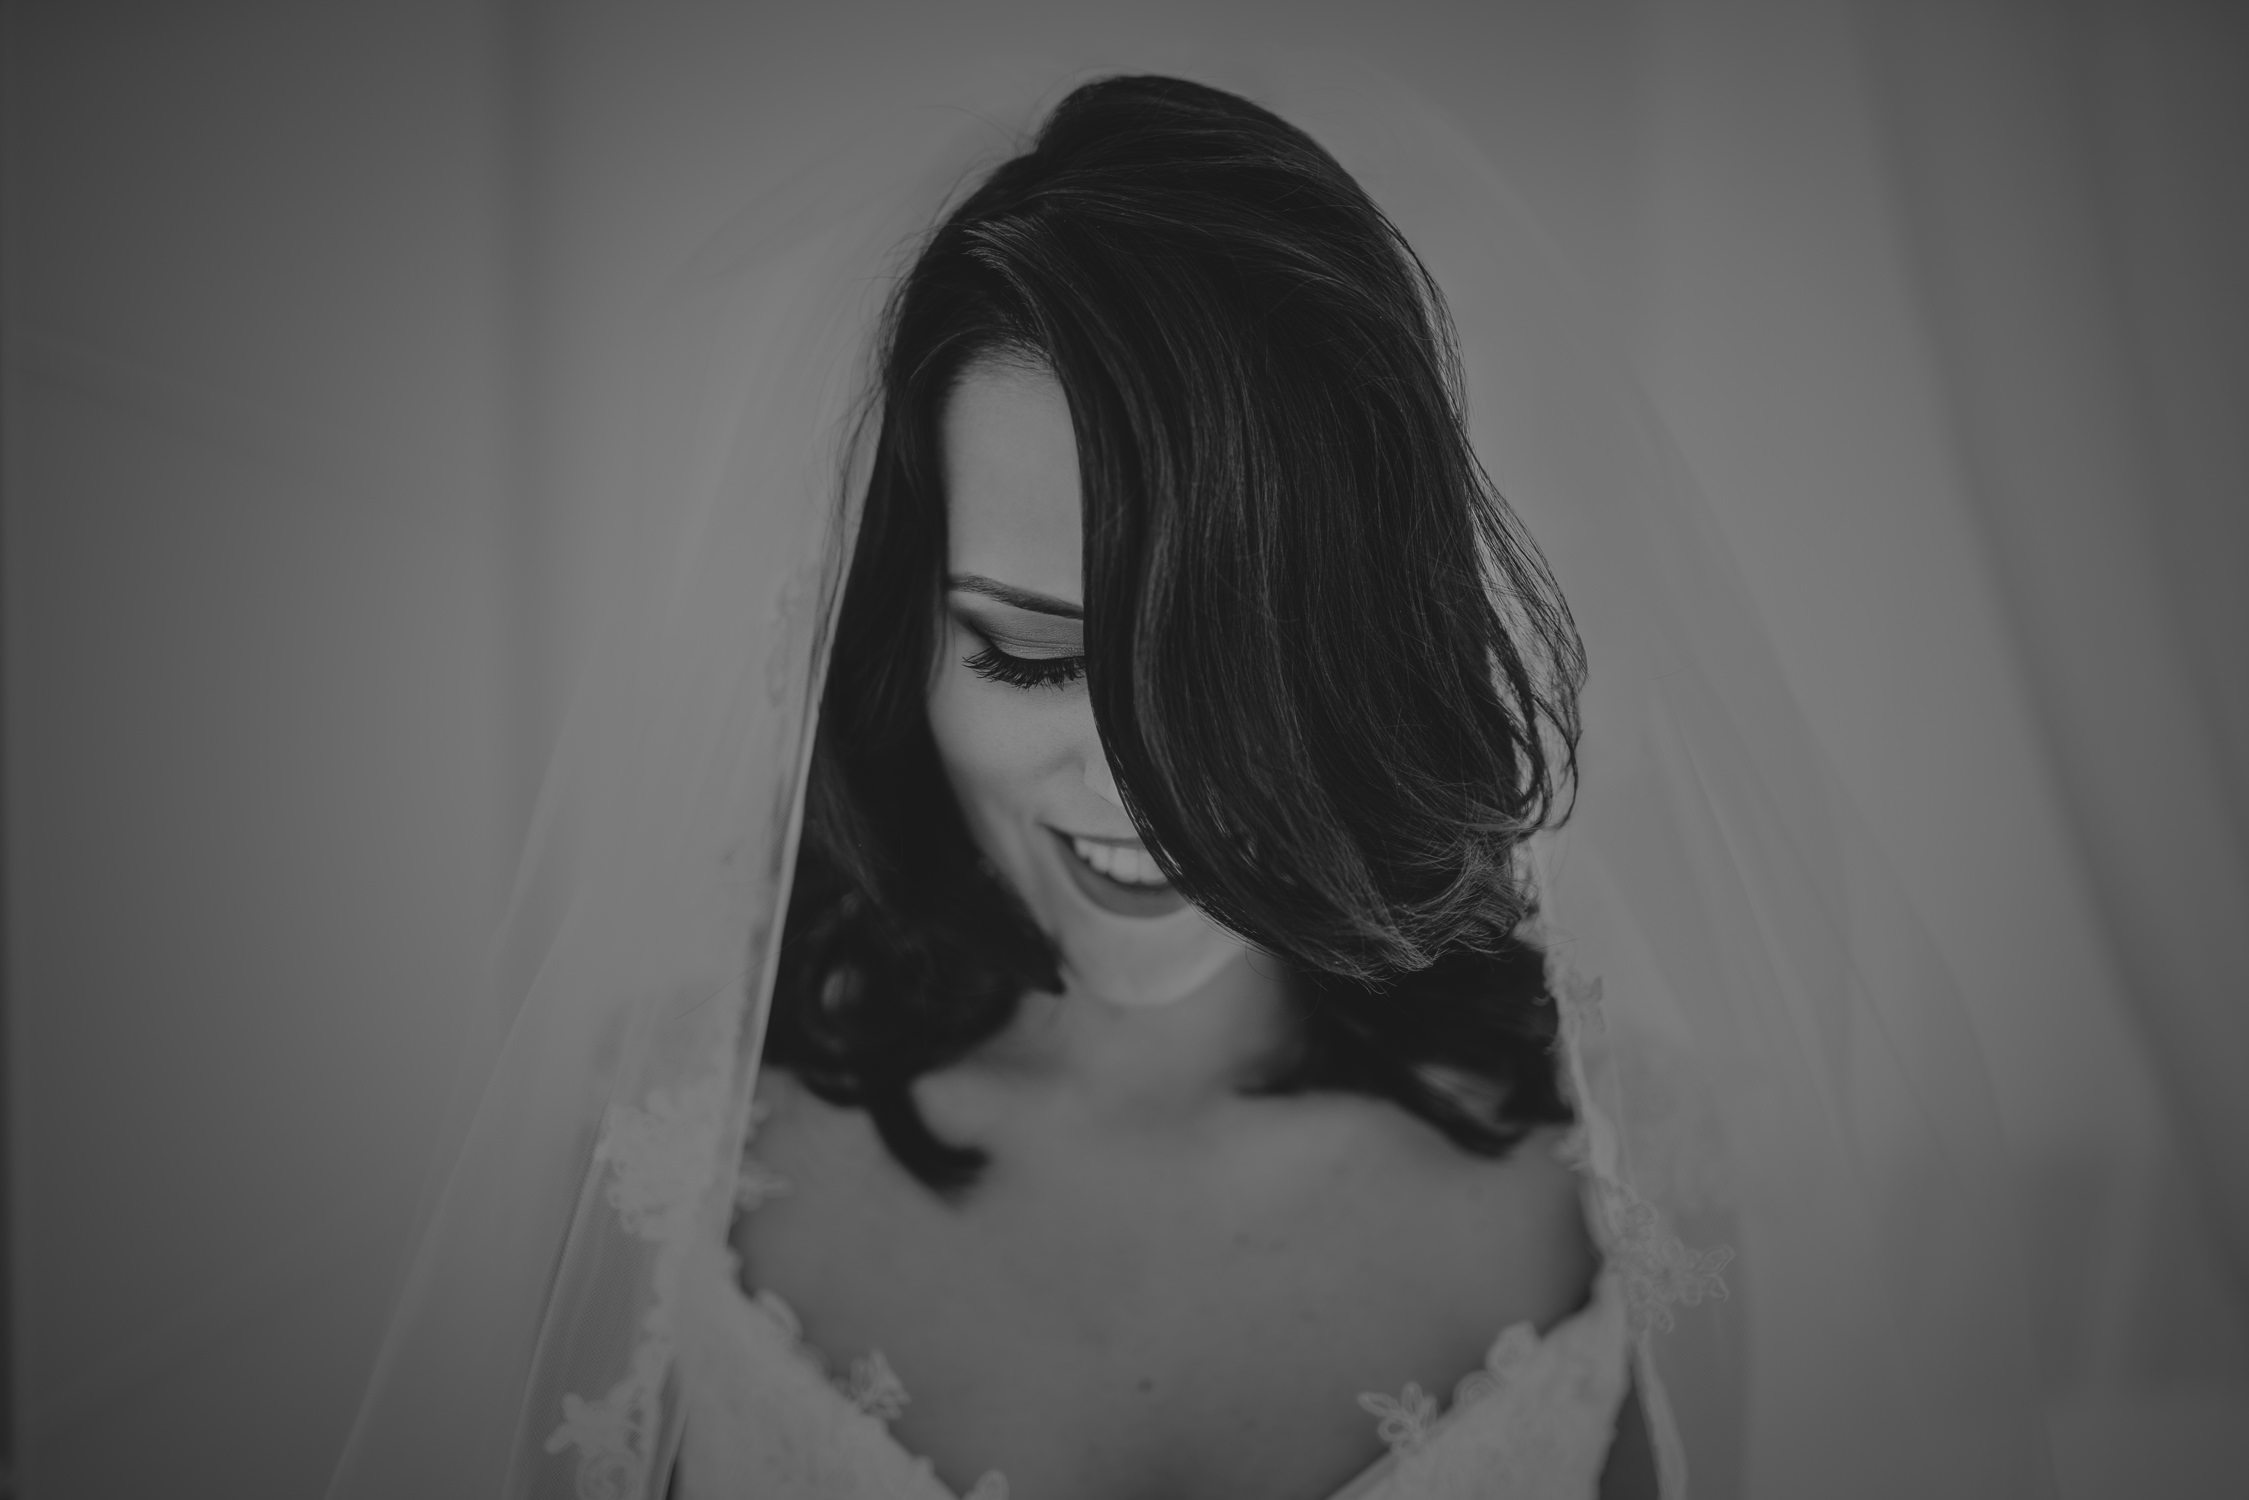 bruidsfotografie-amsterdam-utrecht-trouwfotograaf-mark-hadden-wedding-photography-dado-dalila-023-2.jpg